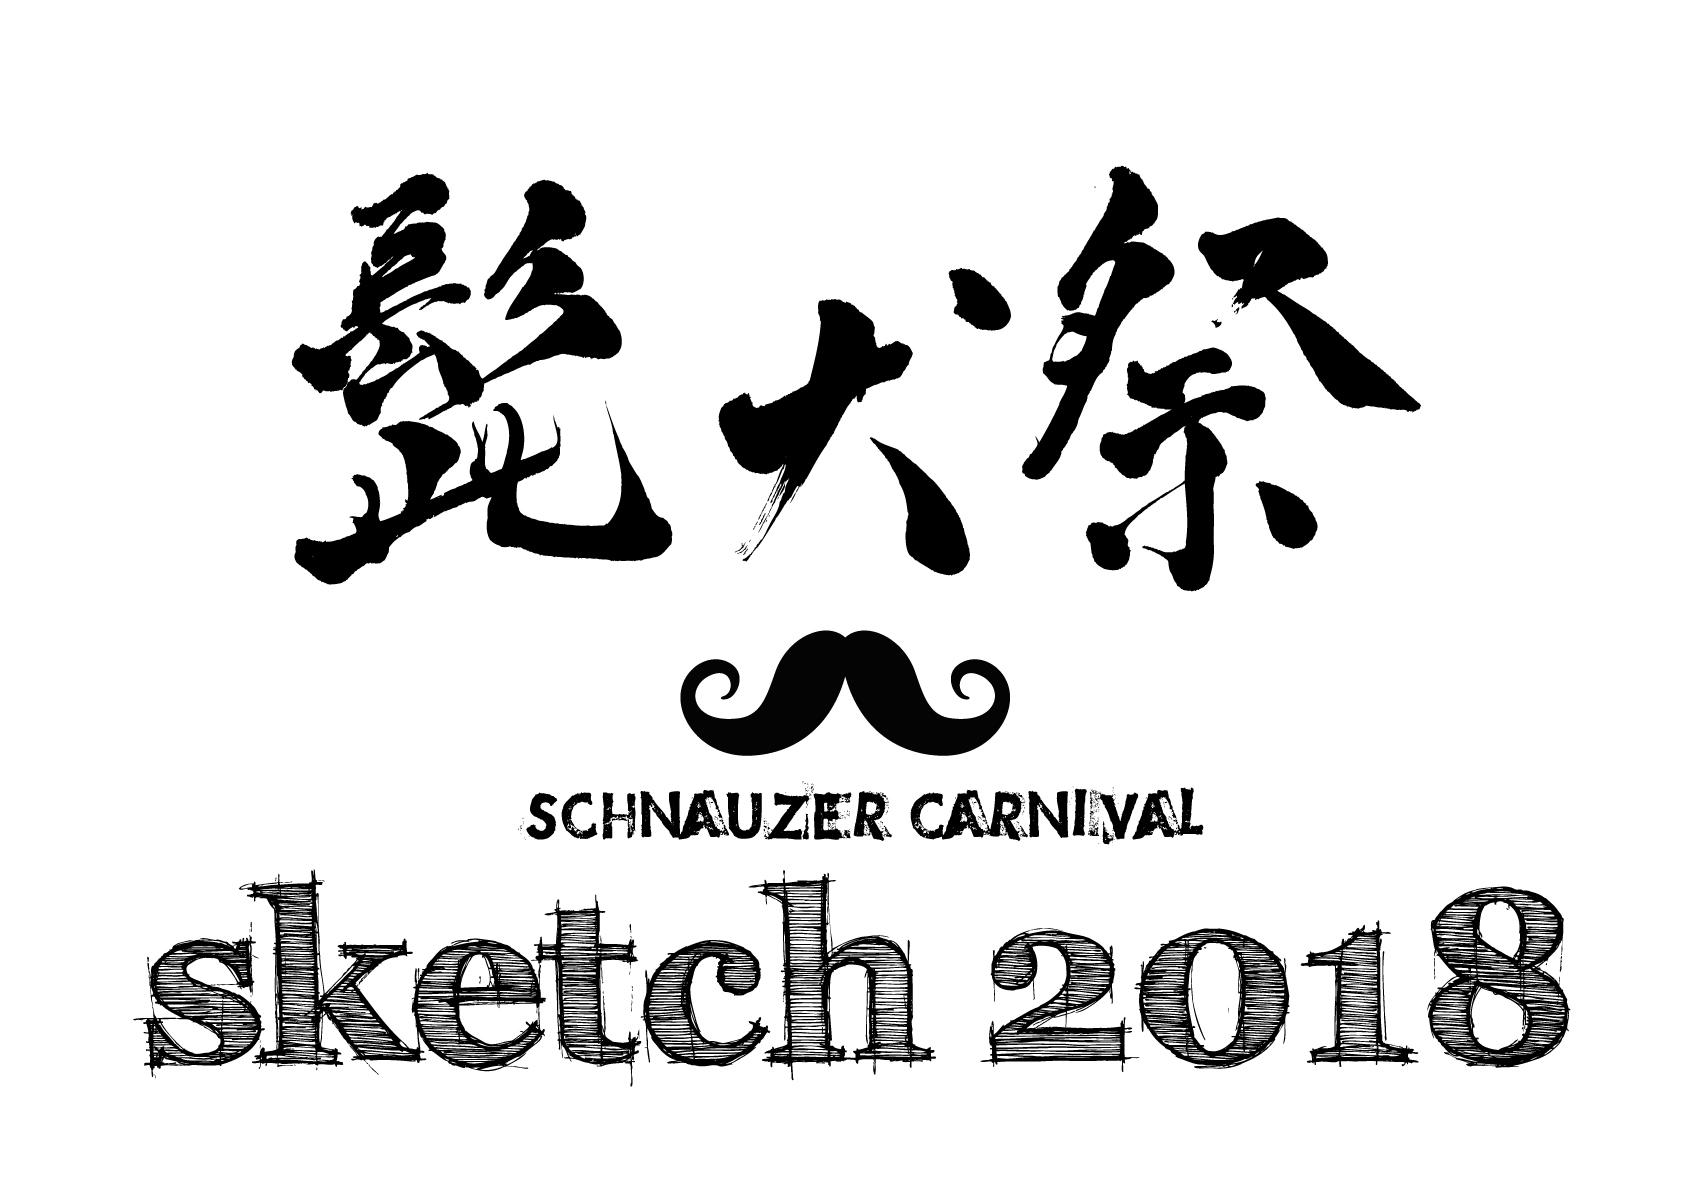 髭犬祭 - SCHNAUZER CARNIVAL 2018 -